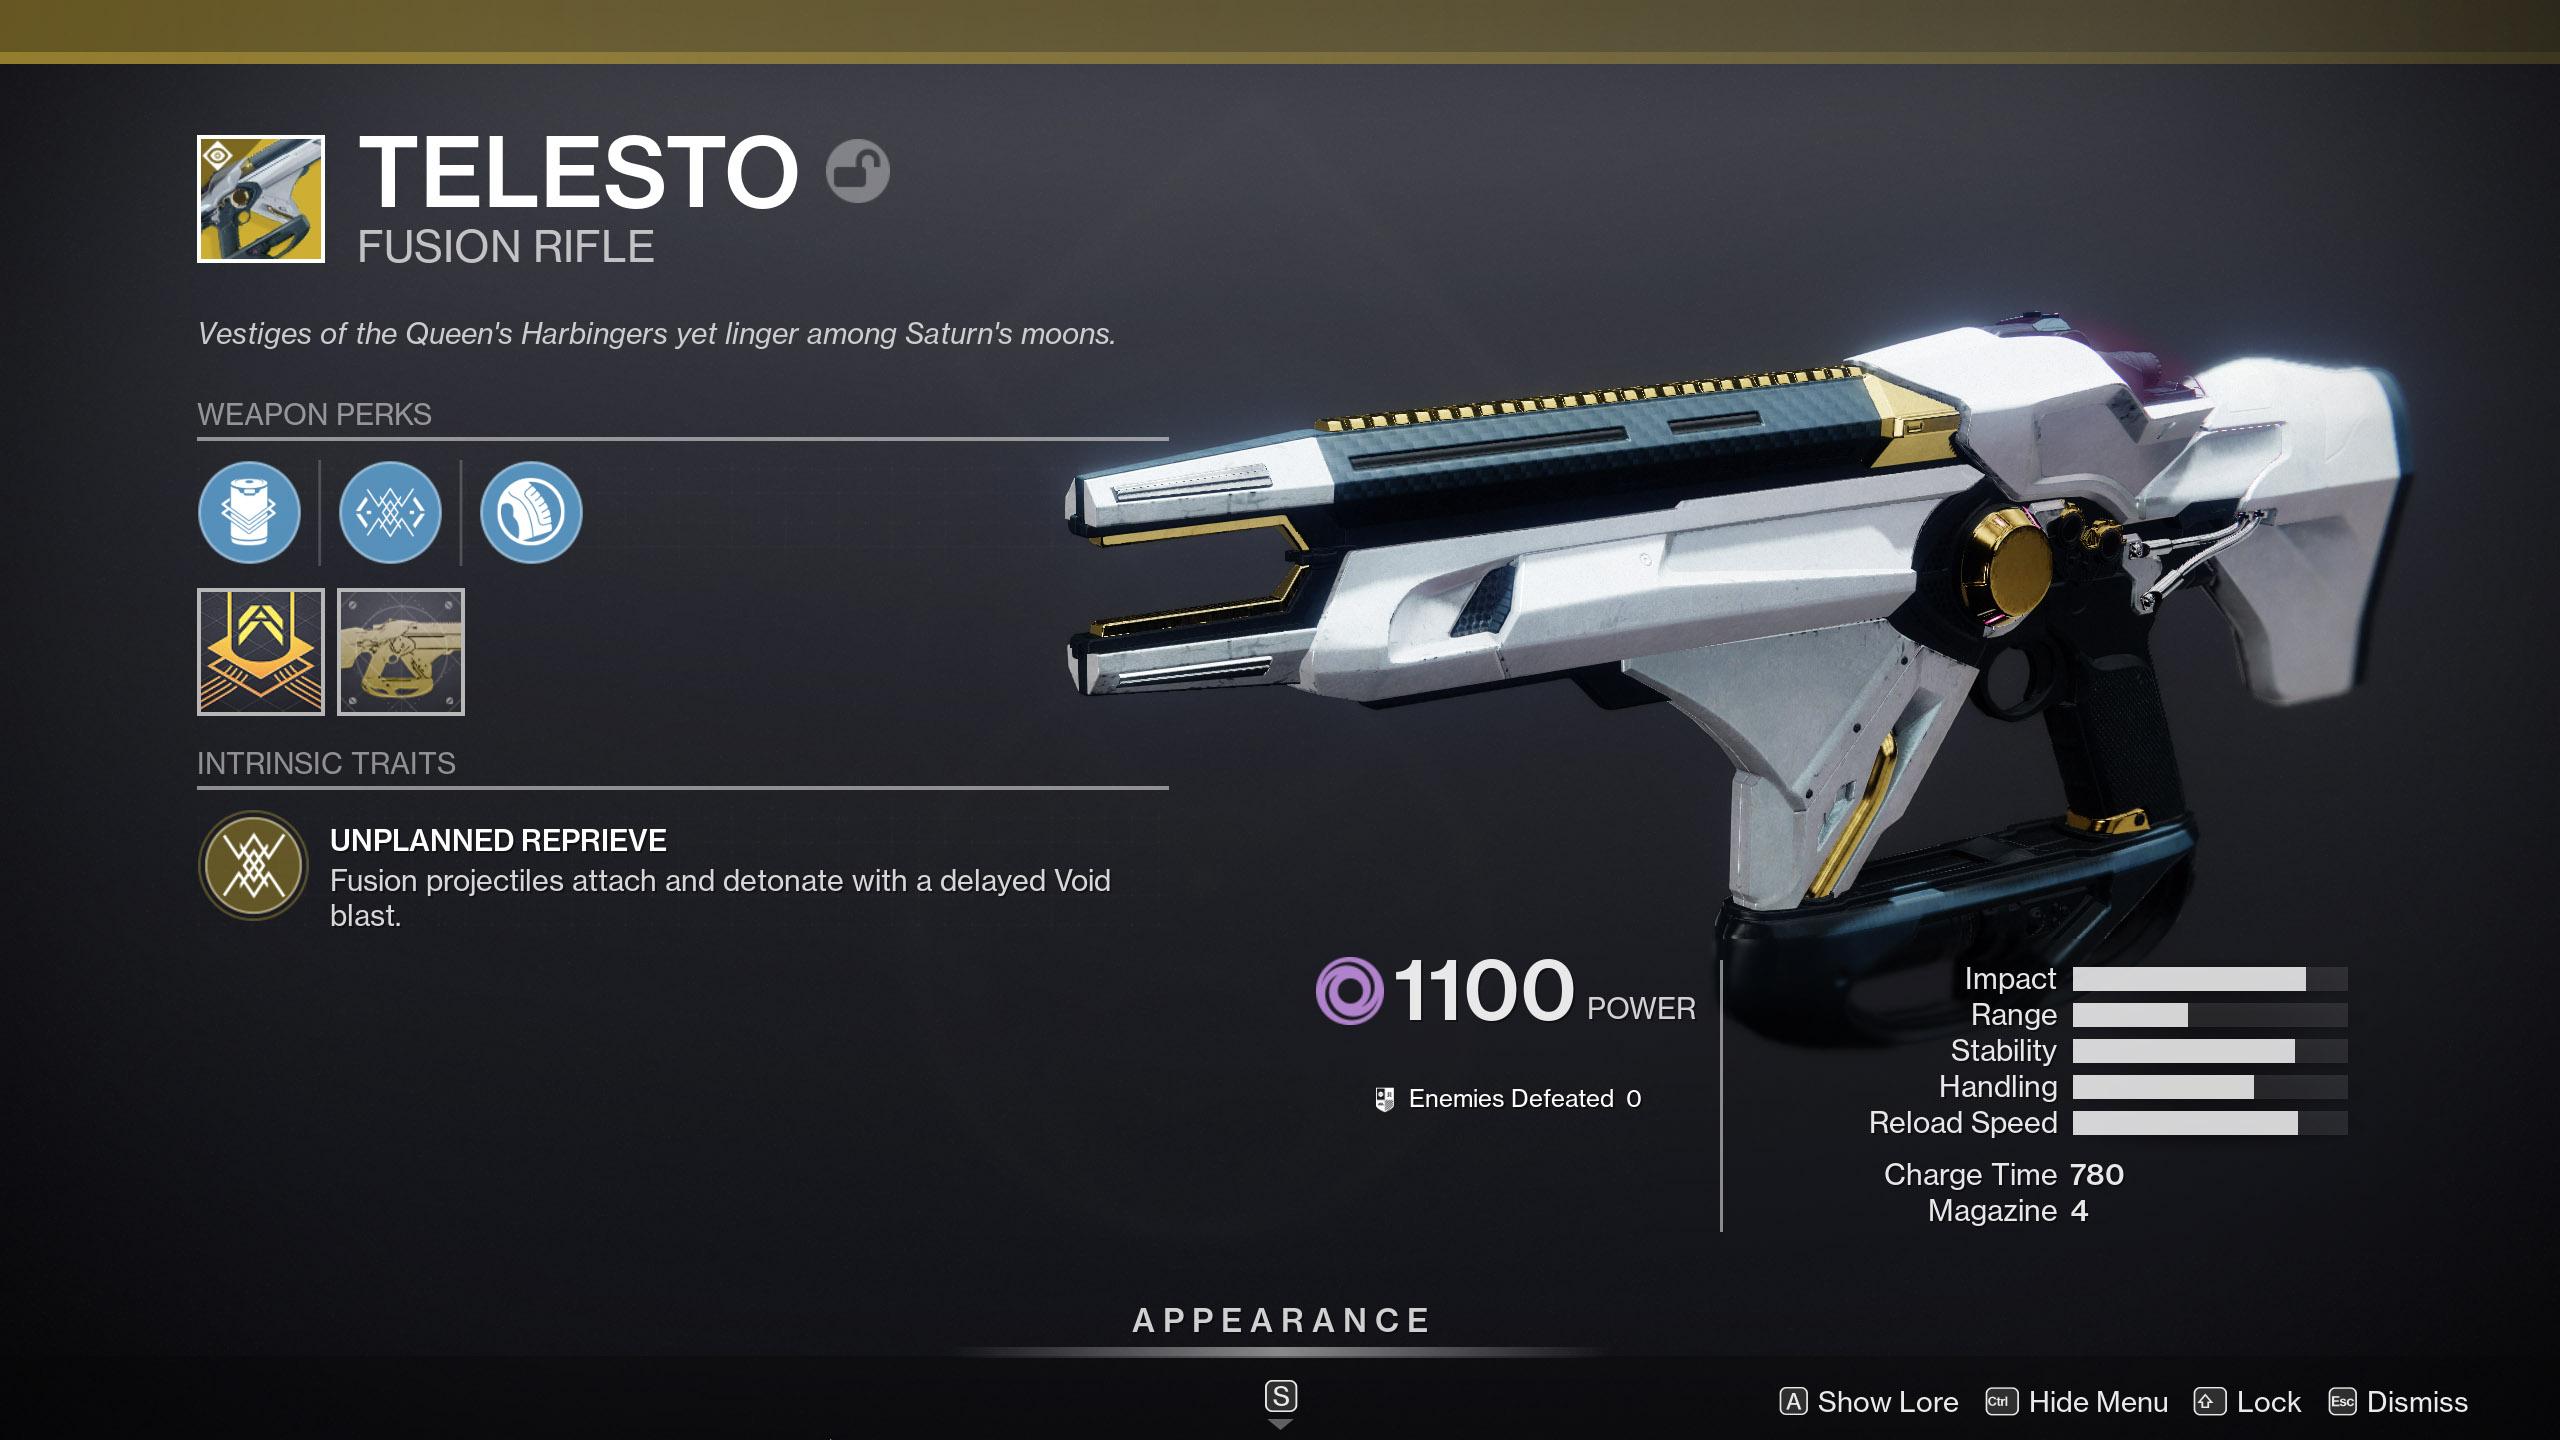 Destiny 2 Hotfix 3.3.0.3 Telesto